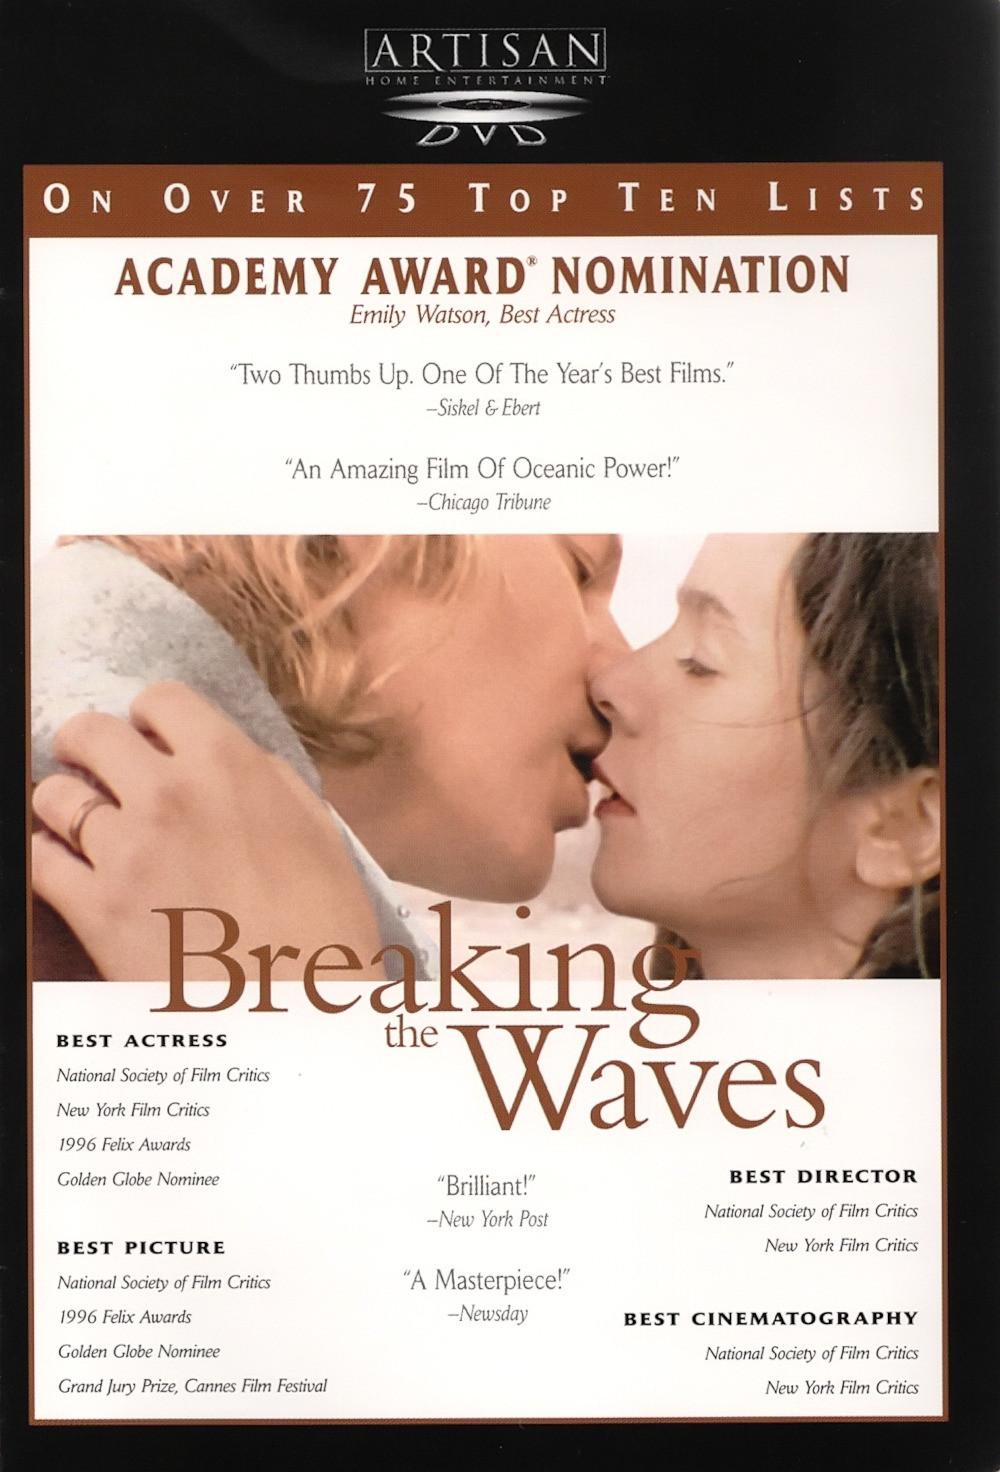 moviesandsongs365: Film review: Breaking the Waves (1996)